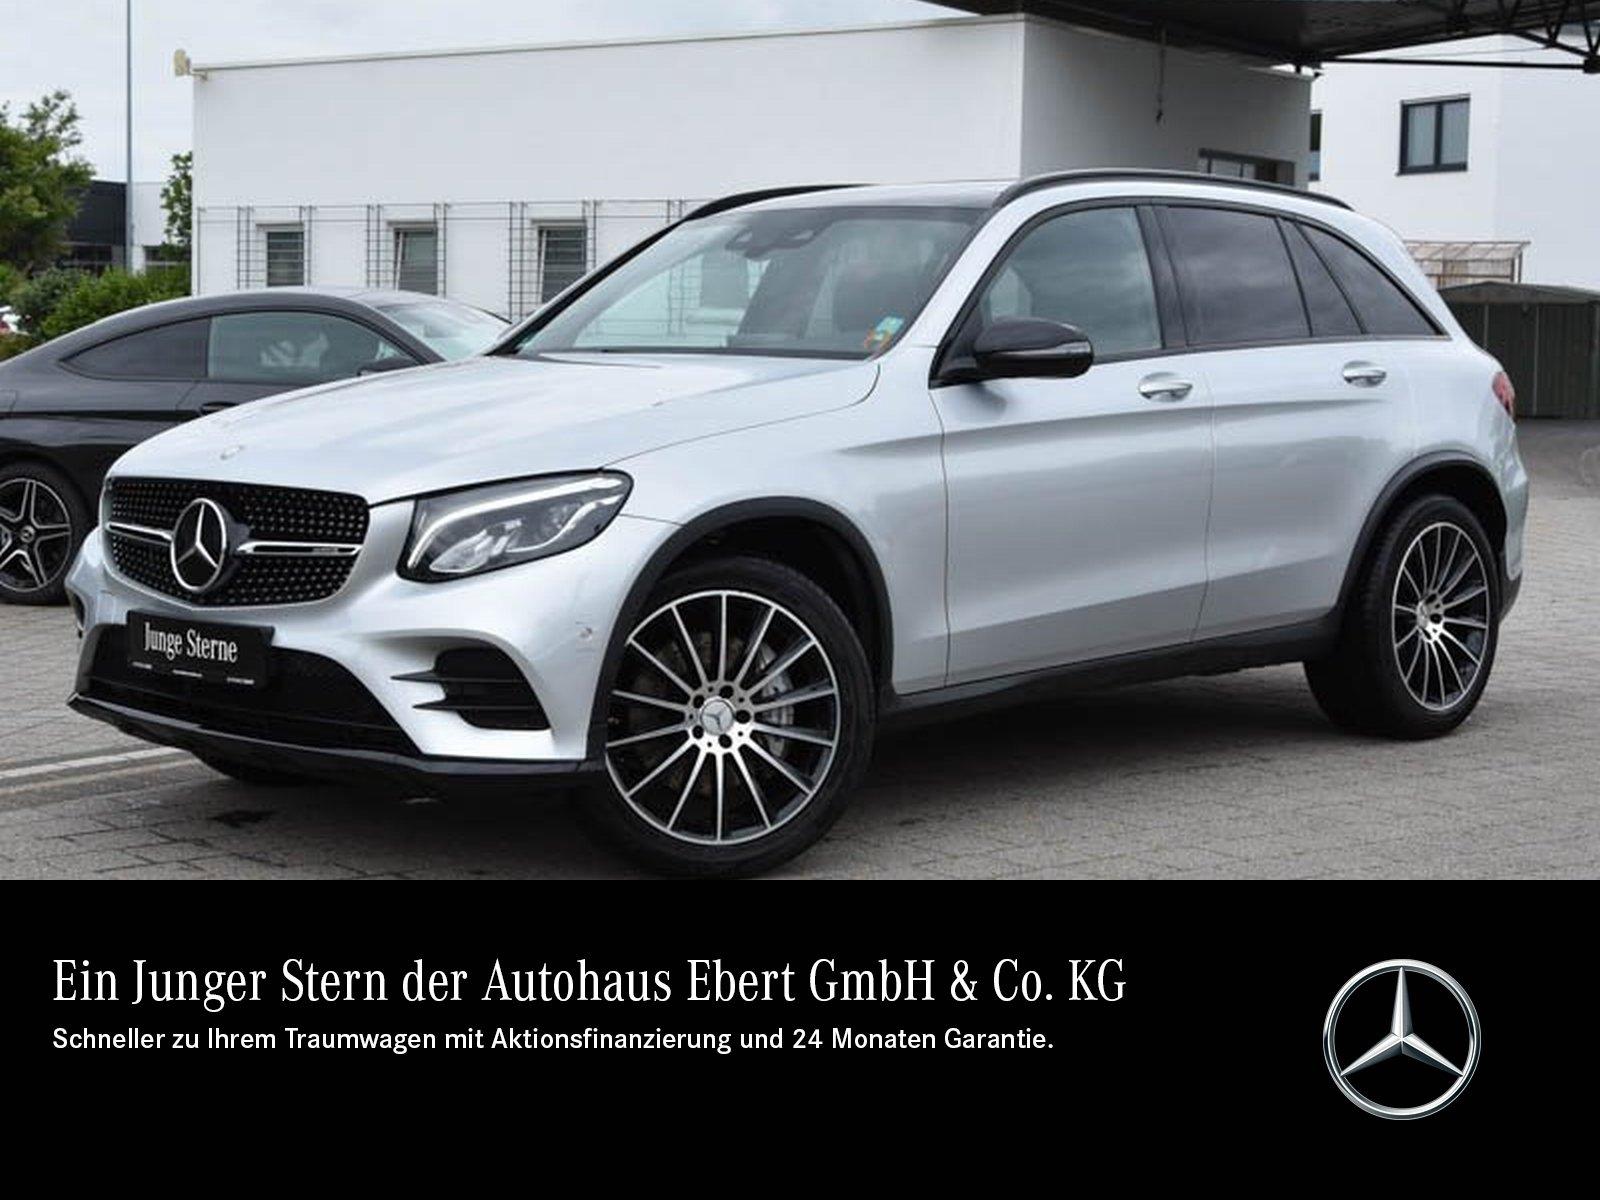 Mercedes-Benz GLC 43 AMG 4M COMAND+PSD+LED+RFK+BURMESTER+NIGHT, Jahr 2016, Benzin